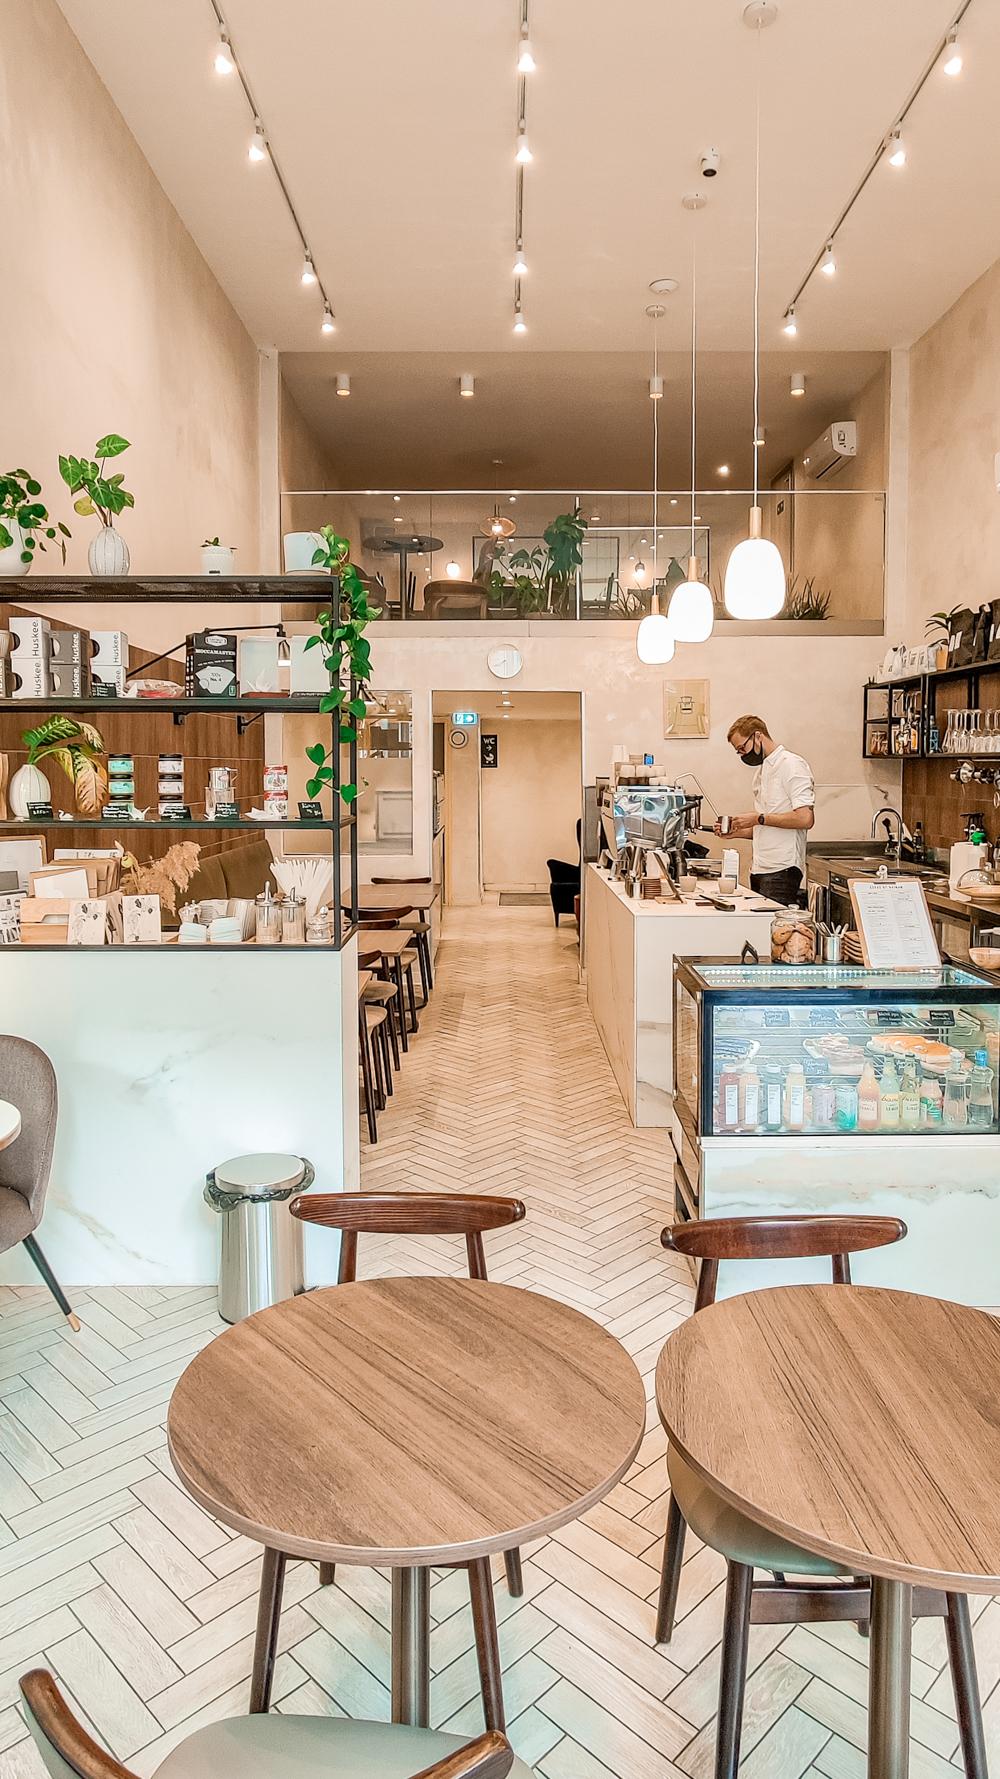 Caphe by Hai Nam - 10 must-visit stylish specialty coffee shops in Budapest, Hungary   Aliz's Wonderland